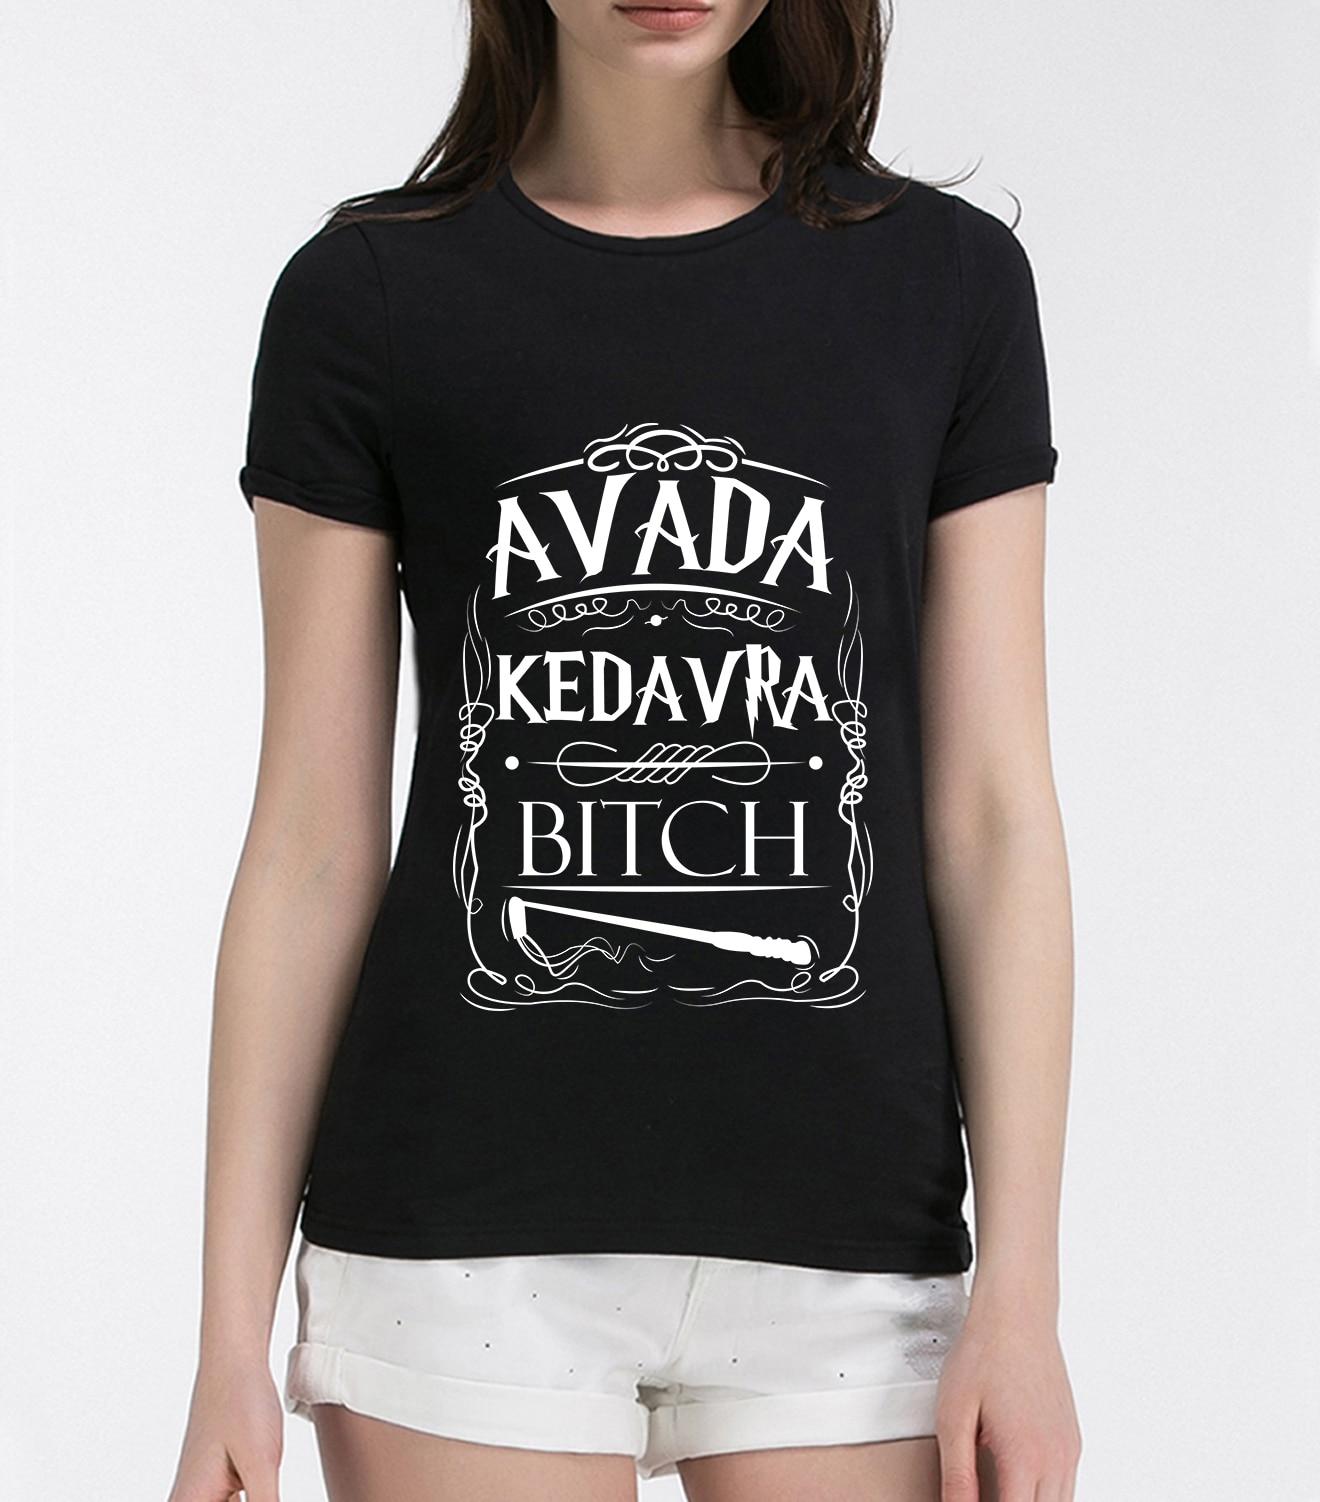 Camiseta Kedavra con letras impresas para mujer, camiseta a la moda de verano 2019 para mujer, camisetas divertidas de marca harajuku kawaii